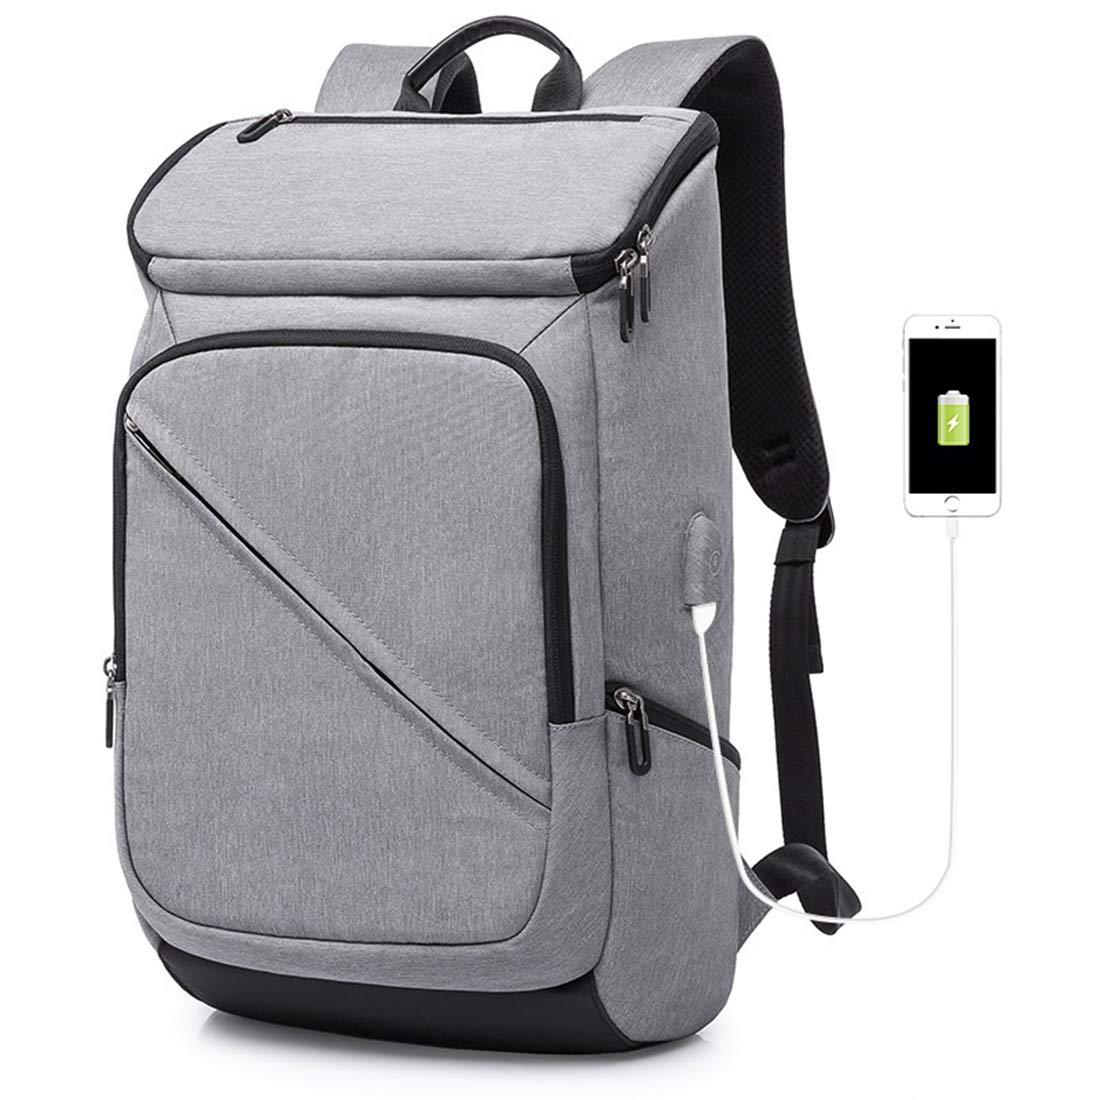 AHWZ メンズ バックパック 多機能カジュアルコンピューターバッグ シンプルカレッジバックパック USBインターフェース  グレー B07JPYNTSC